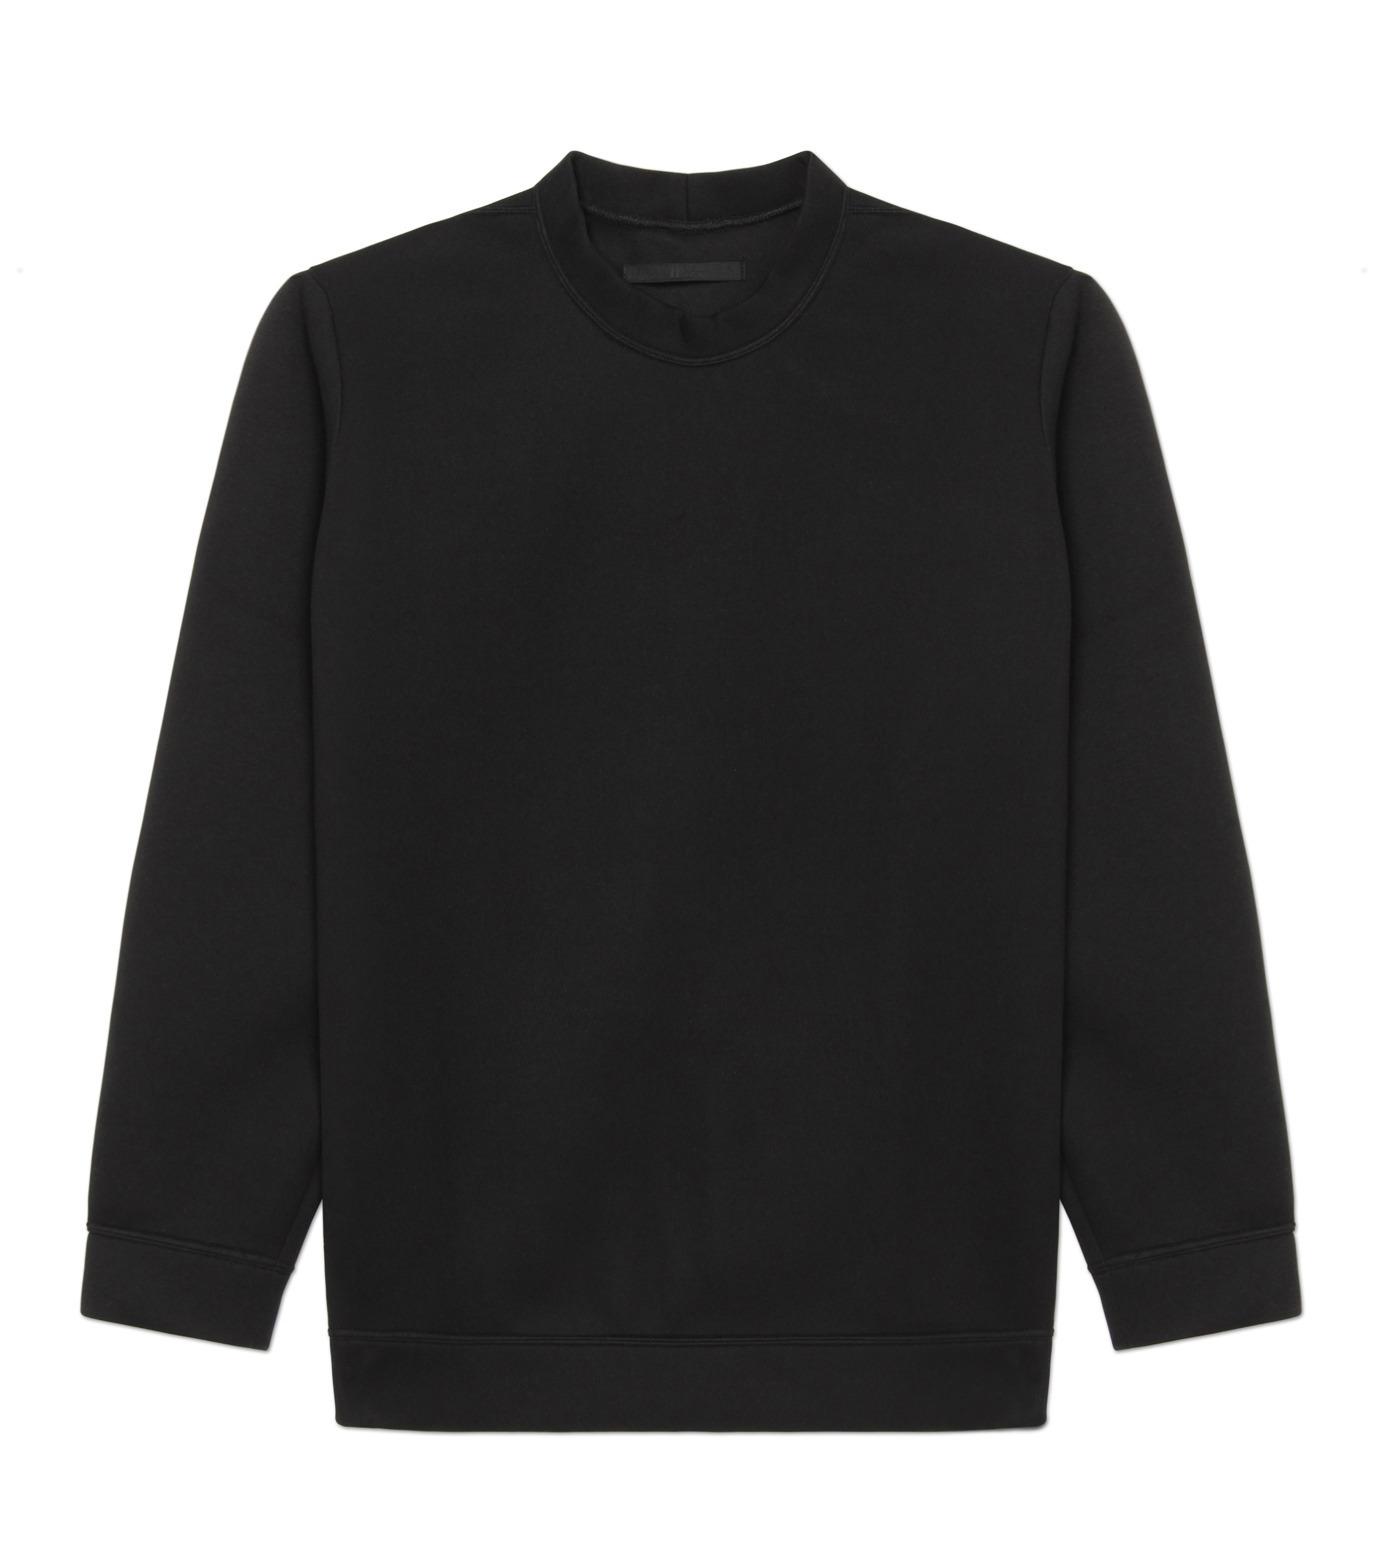 HL HEDDIE LOVU(エイチエル・エディールーヴ)のBONDING SWEATSHIRT-BLACK(カットソー/cut and sewn)-18S92001-13 拡大詳細画像4